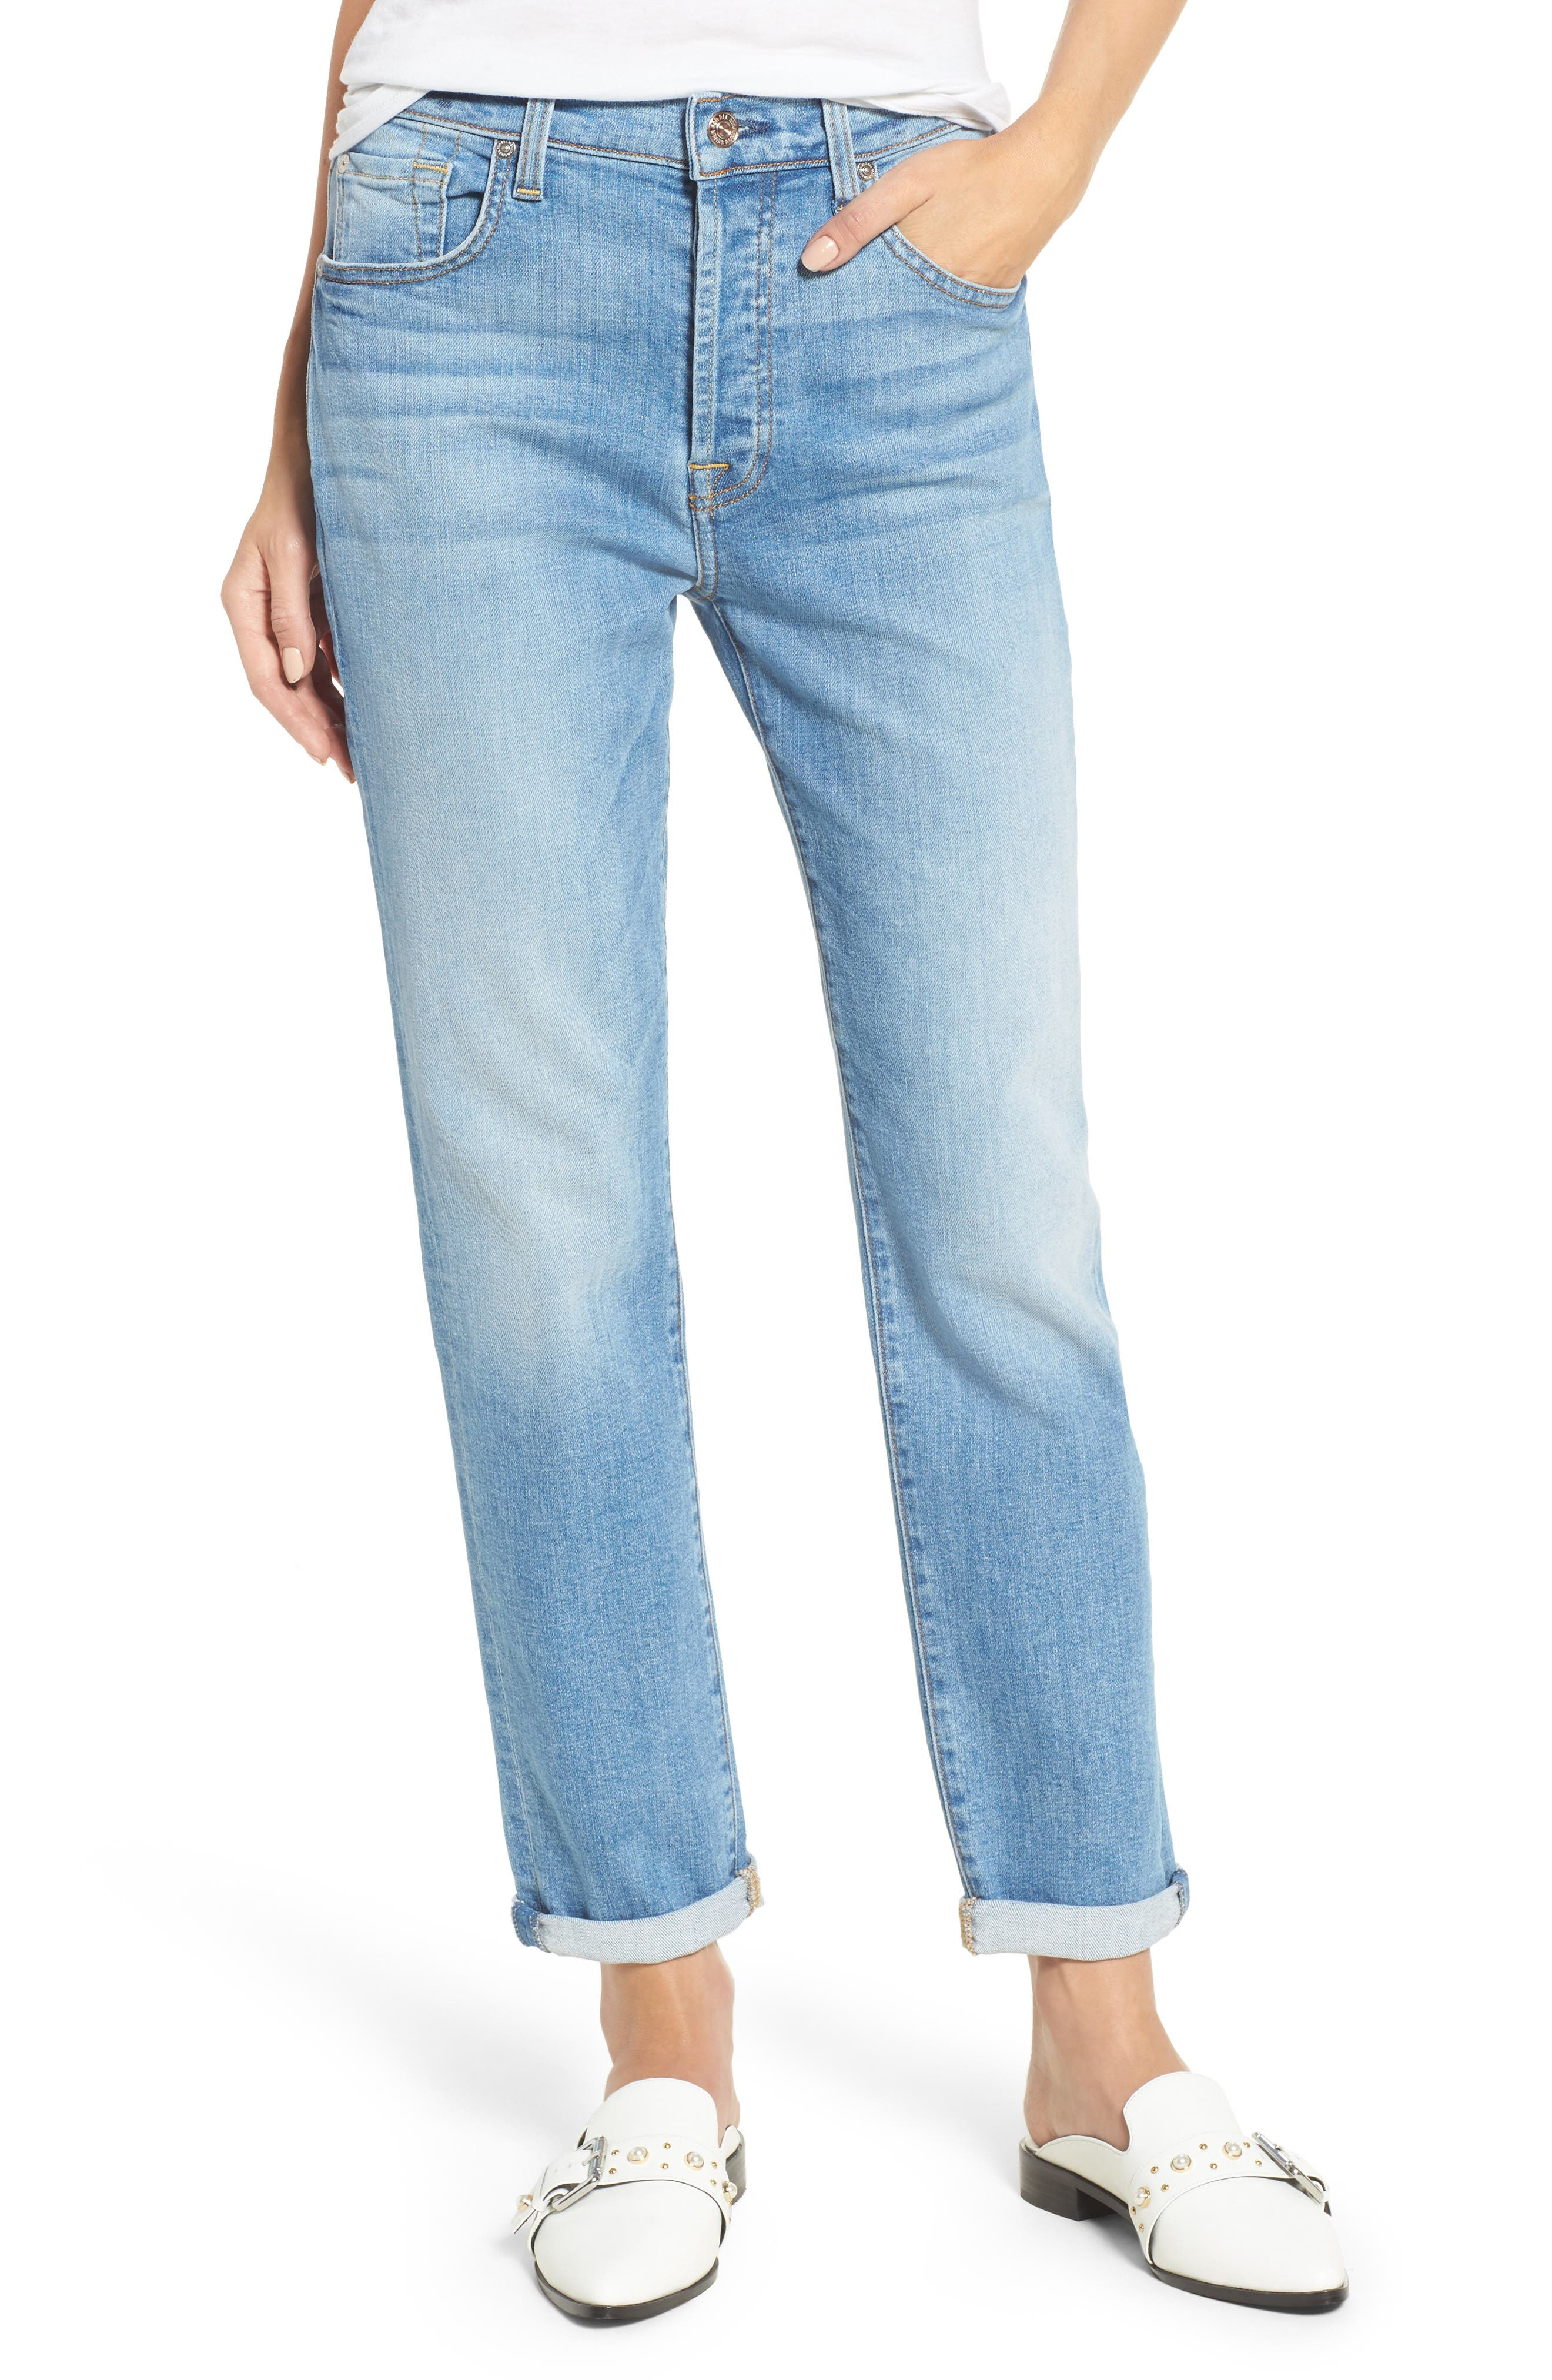 Josefina High Waist Crop Boyfriend Jeans,                             Main thumbnail 1, color,                             400